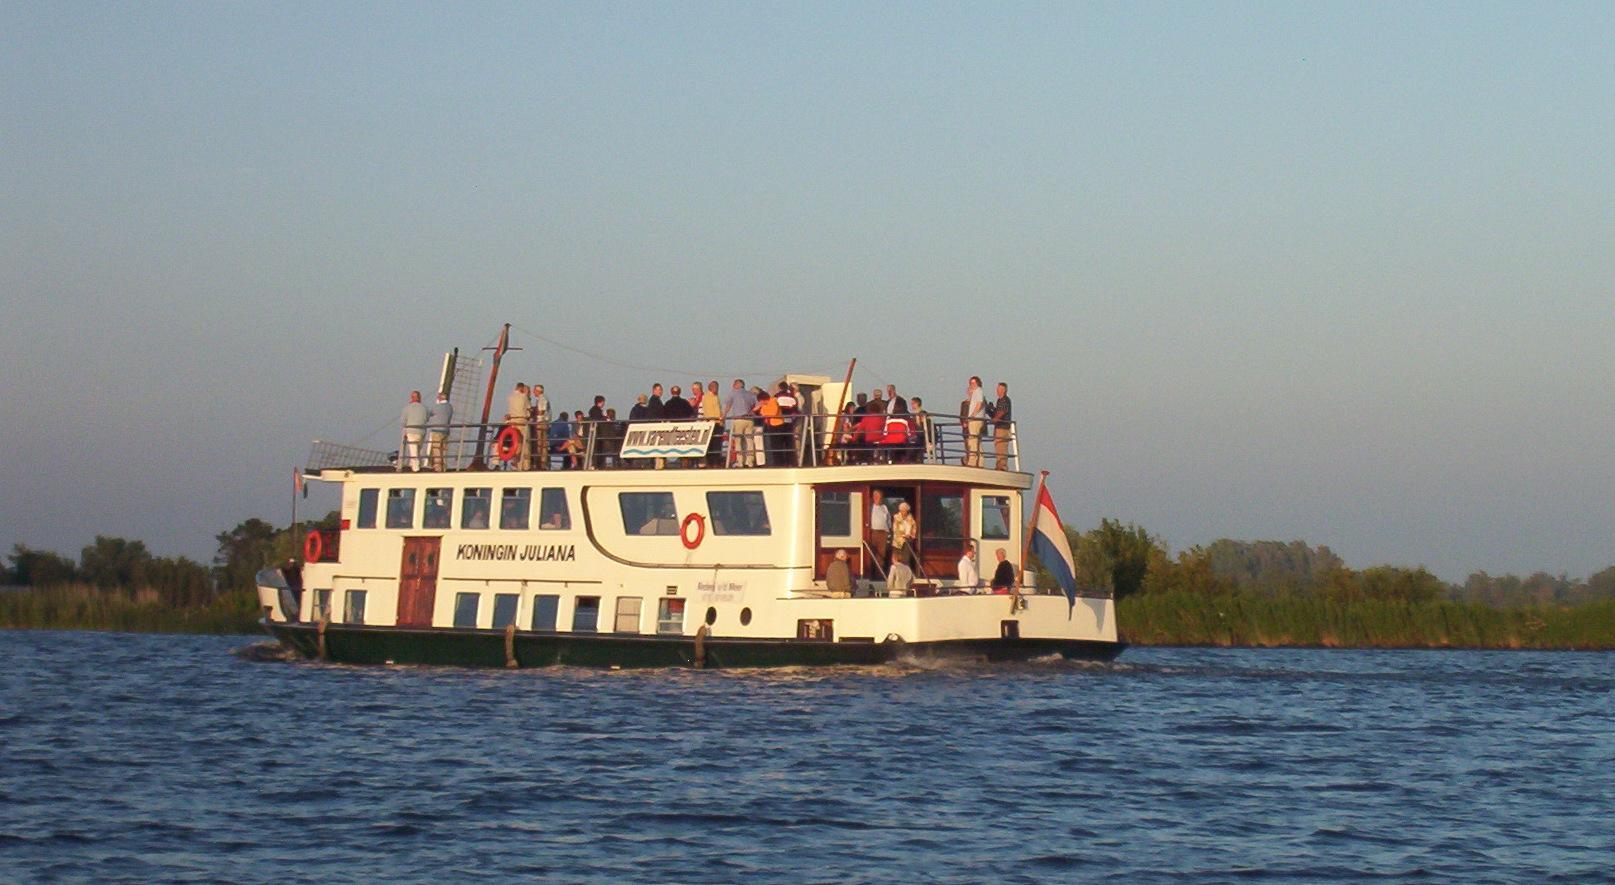 Rederij van der Meer op BruidsLocaties.nl Golfbaan Spaarnwoude